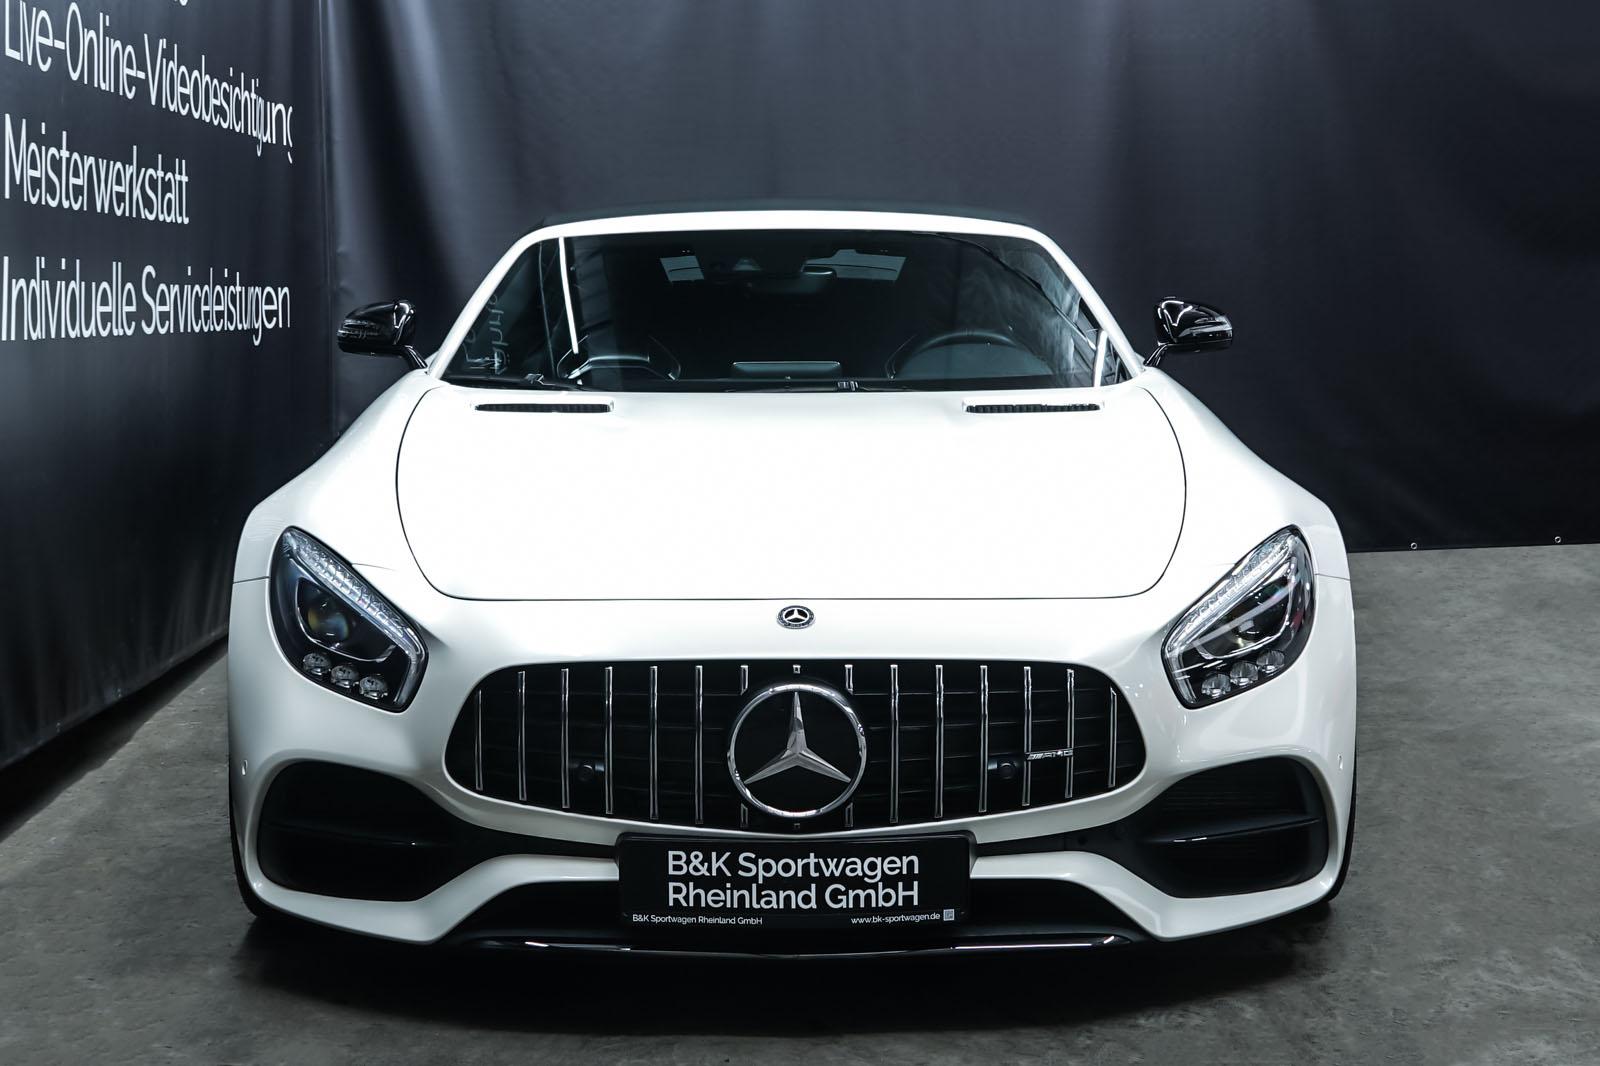 11Mercedes_Benz_AMG_GT_Roadster_Weiss_Schwarz_MB-9710_1_w